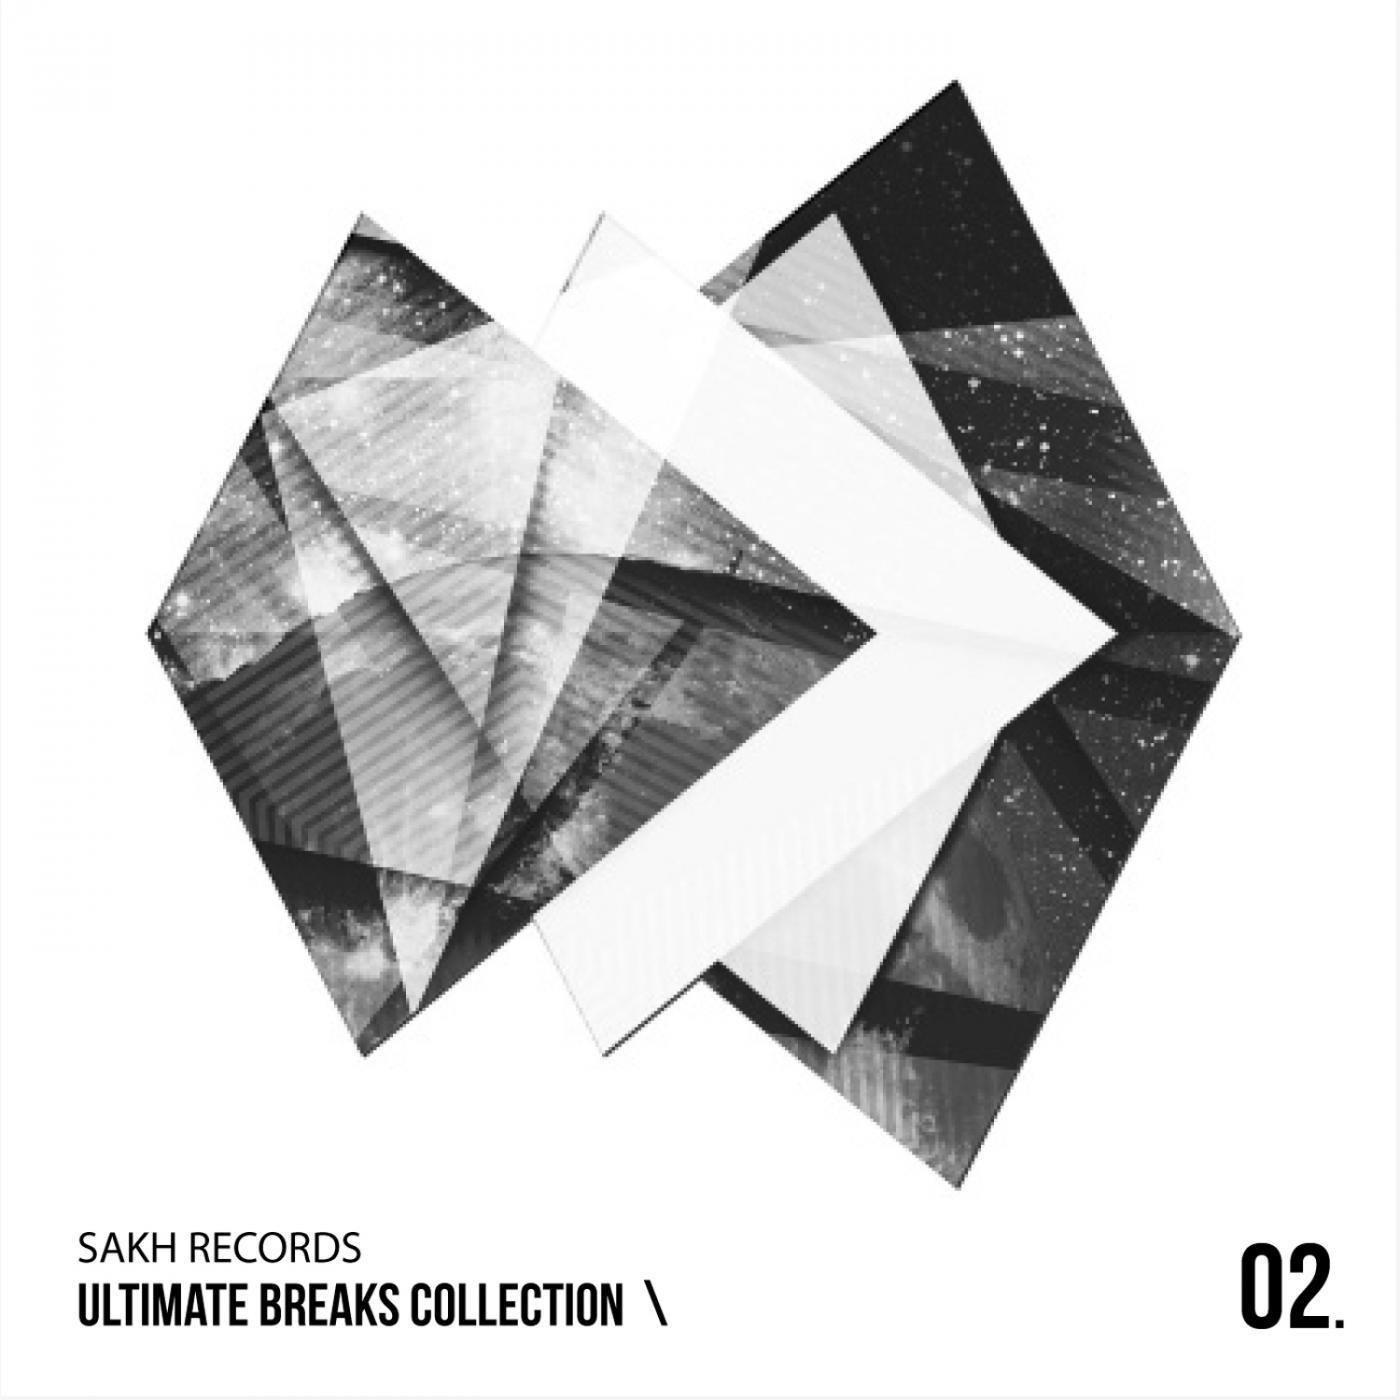 Valentin van Corner - Sweet Passion (Intro Uplifting Mix)